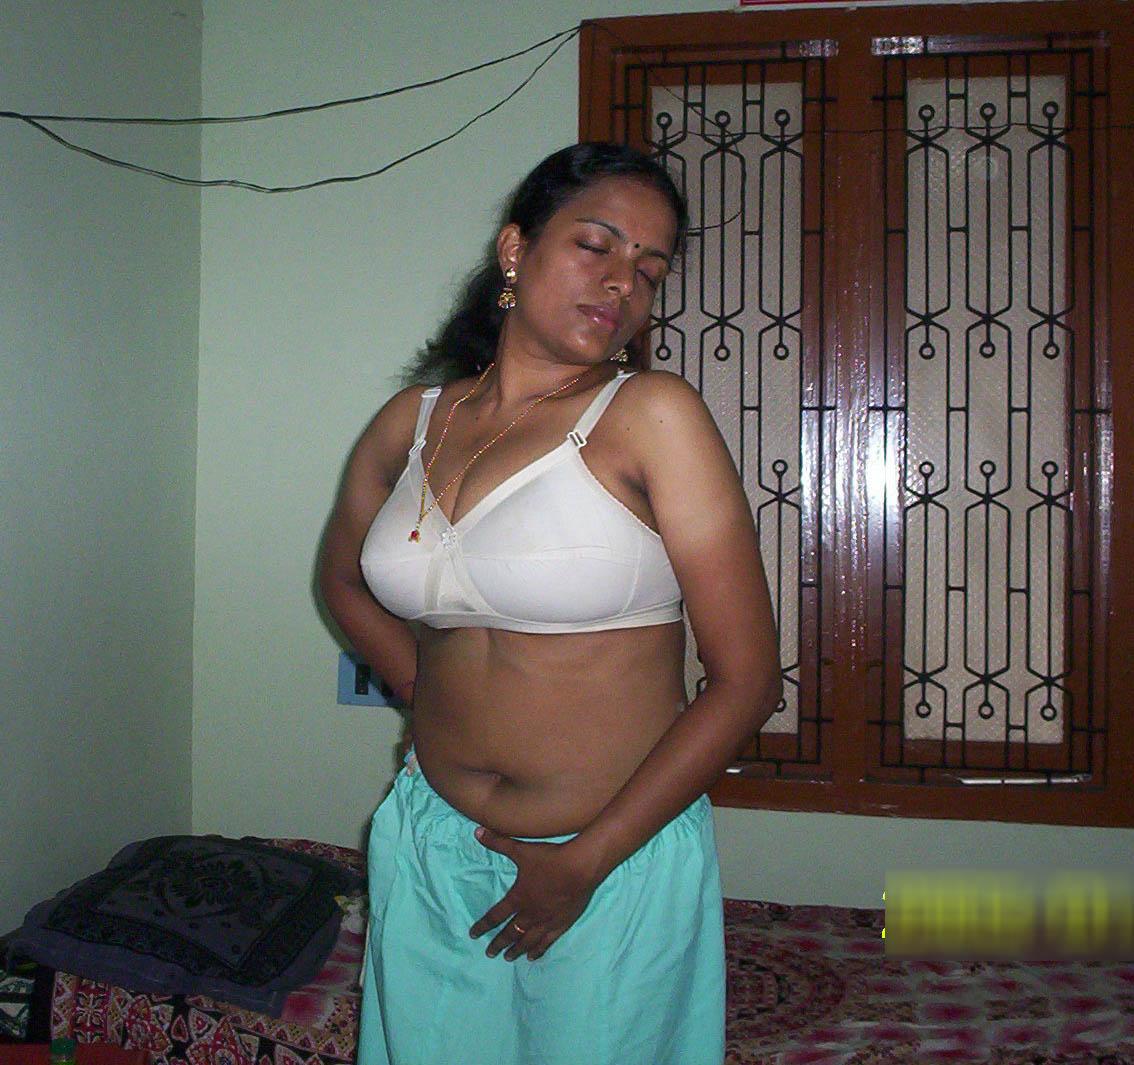 mallu aunty hot blogspot